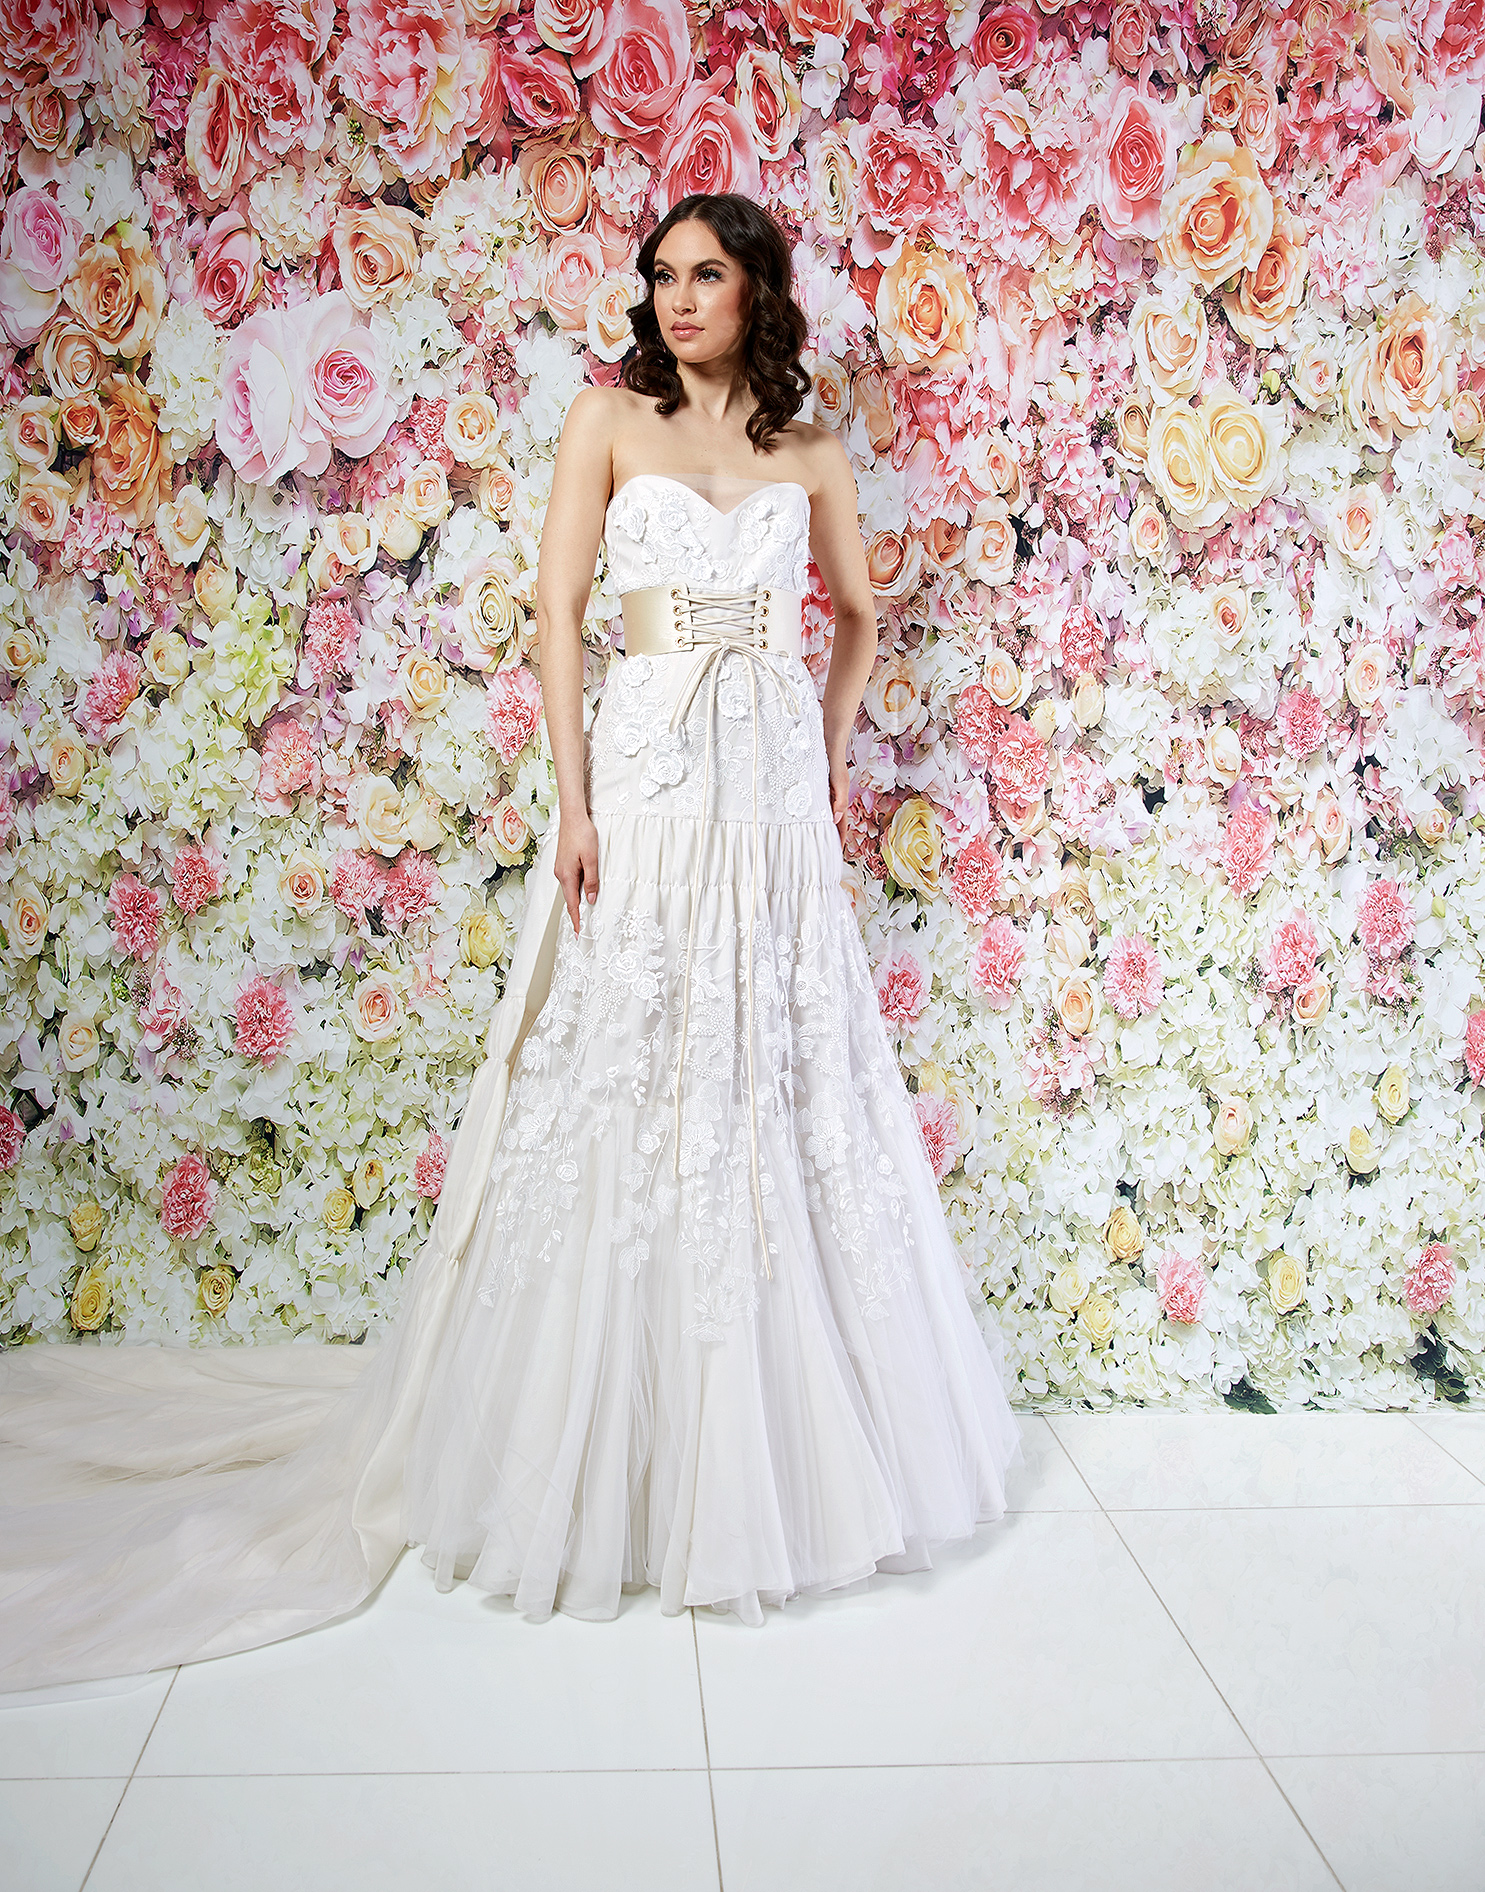 randi rahm wedding dress spring 2019 belted a-line applique